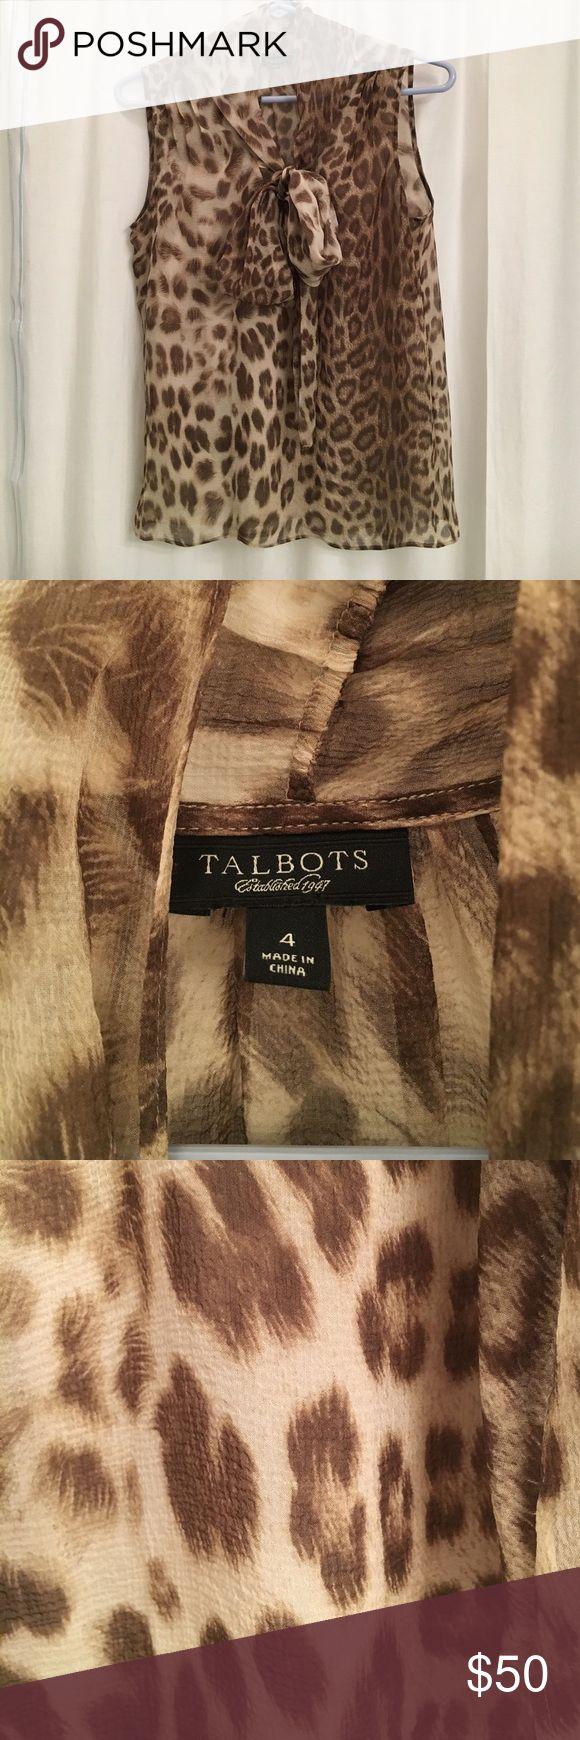 Selling this Sheer Silk Leopard Print Pussy Bow Top on Poshmark! My username is: katarina32. #shopmycloset #poshmark #fashion #shopping #style #forsale #Talbots #Tops